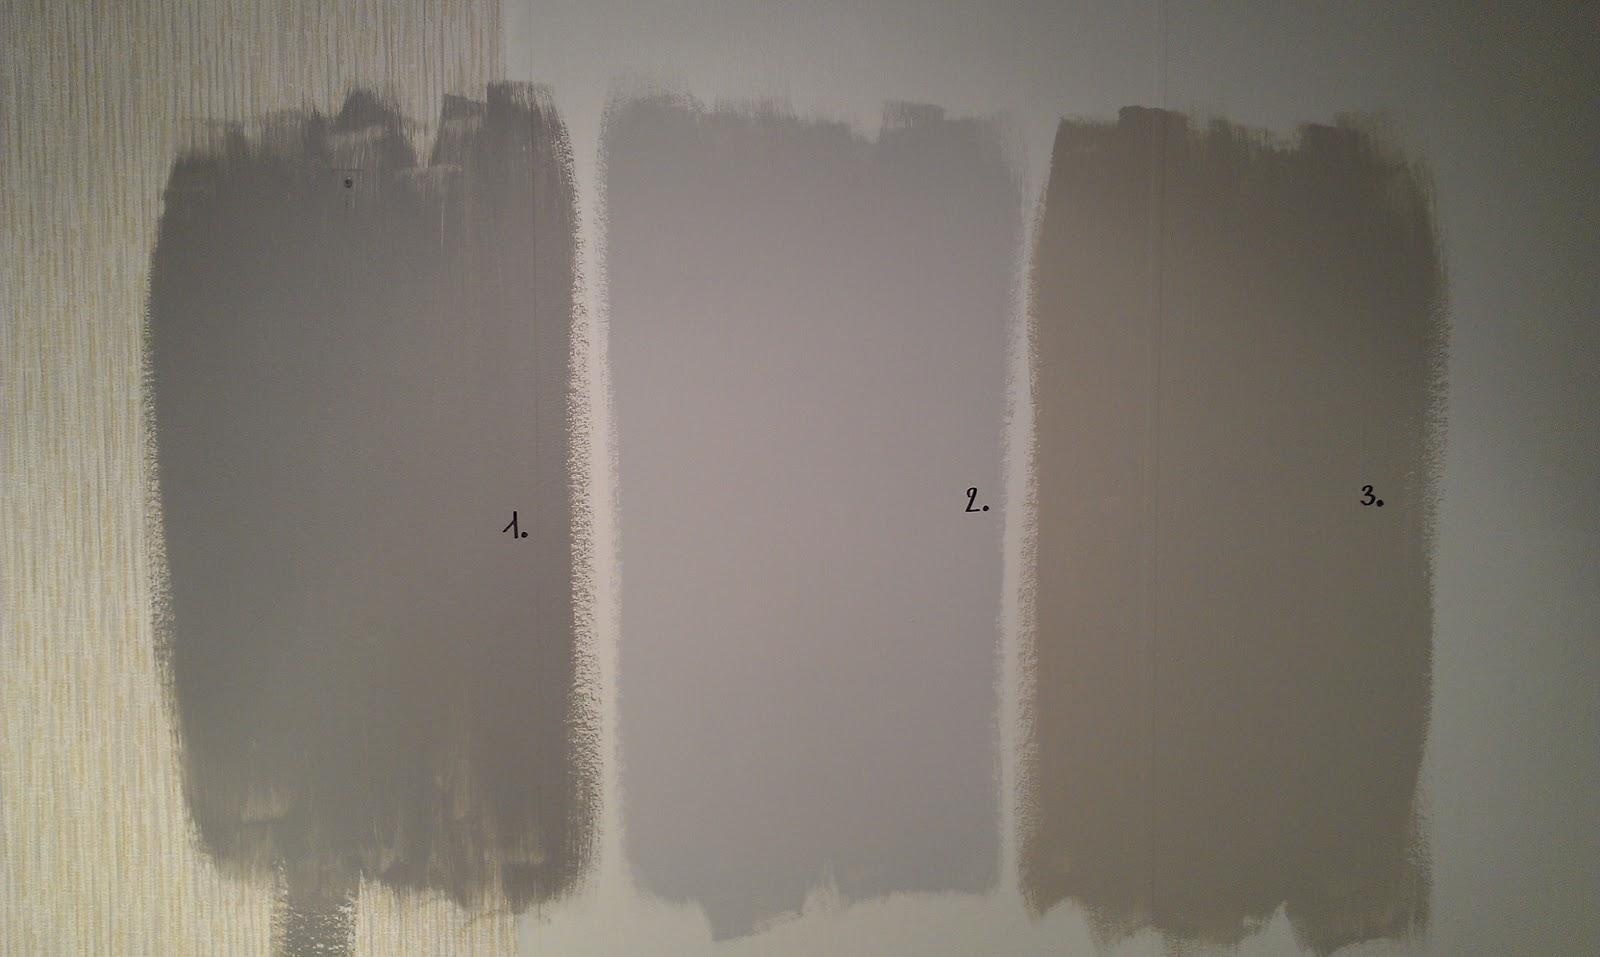 28 MAGNOLIA AVENUE: Hvilken veggfarge til det nye soverommet?